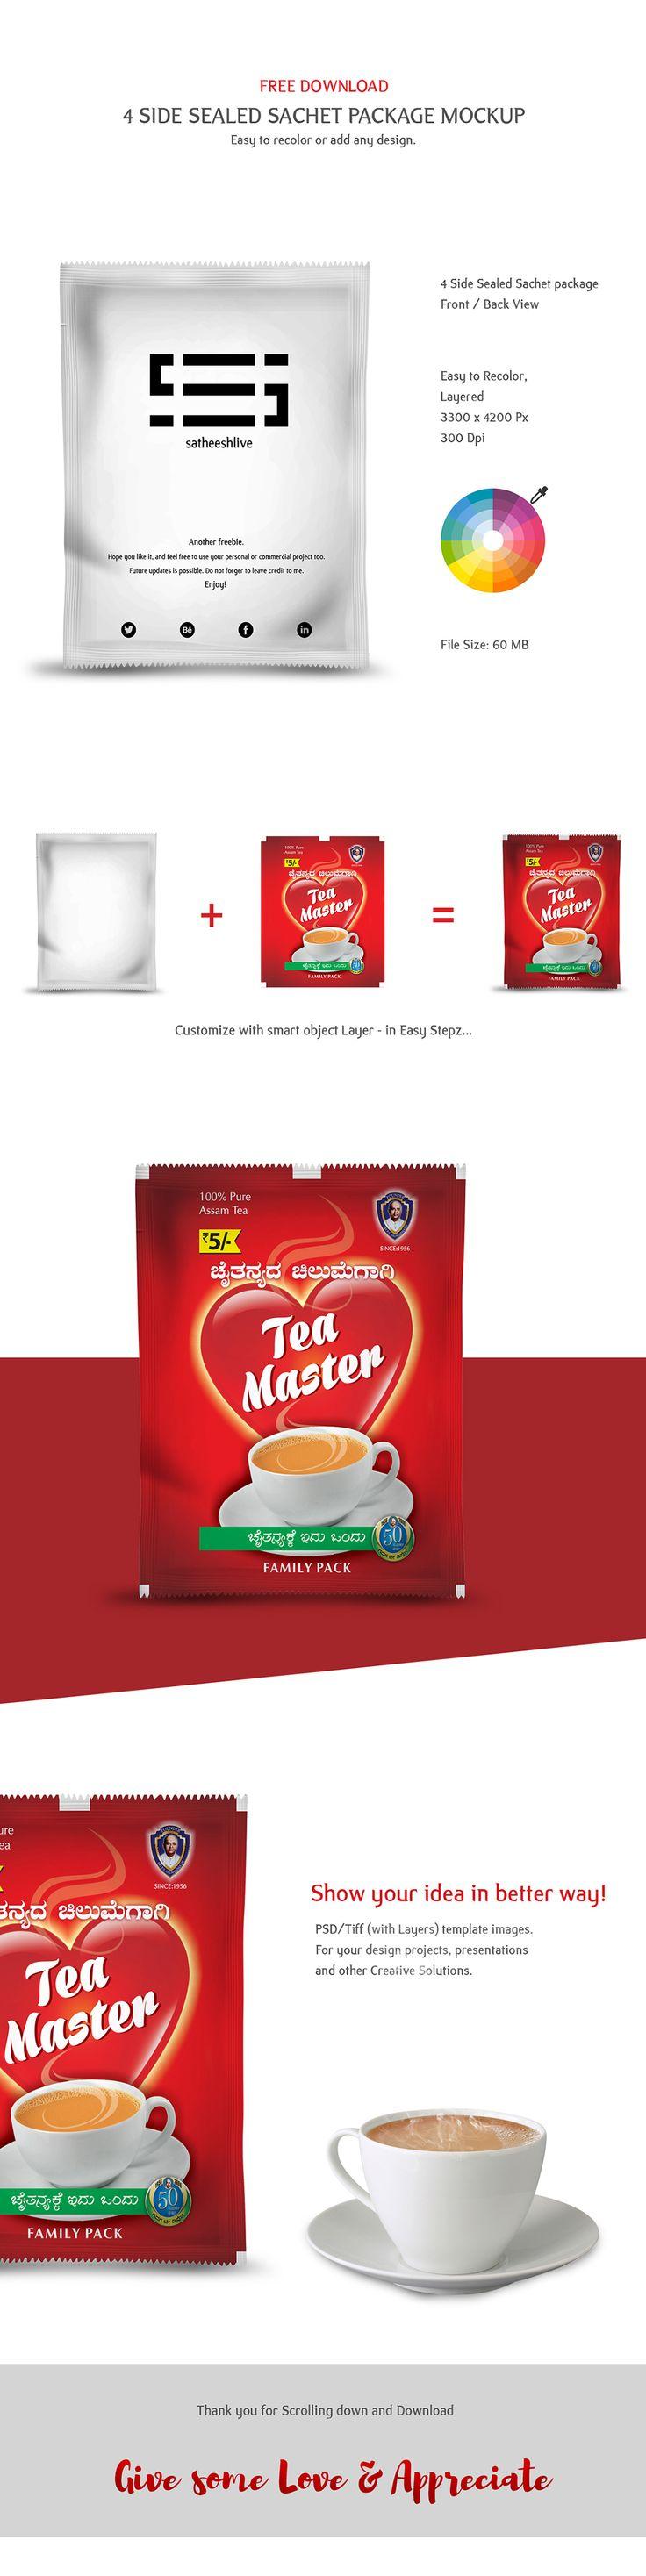 Free Individual Wrapped Sachet PSD mockup #free #tea #coffee #sachet